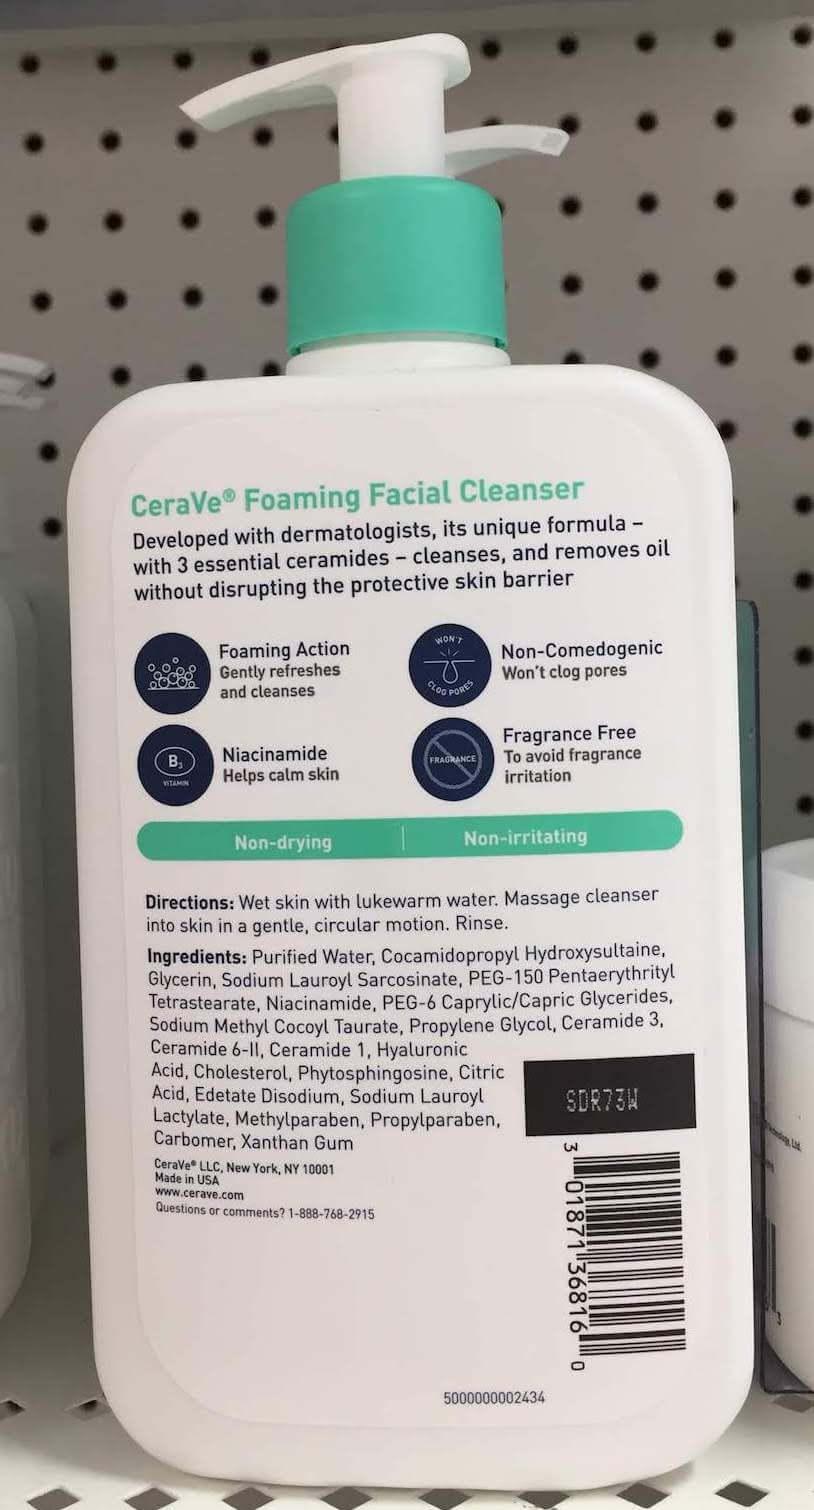 CeraVe foaming facial cleanser formula change review